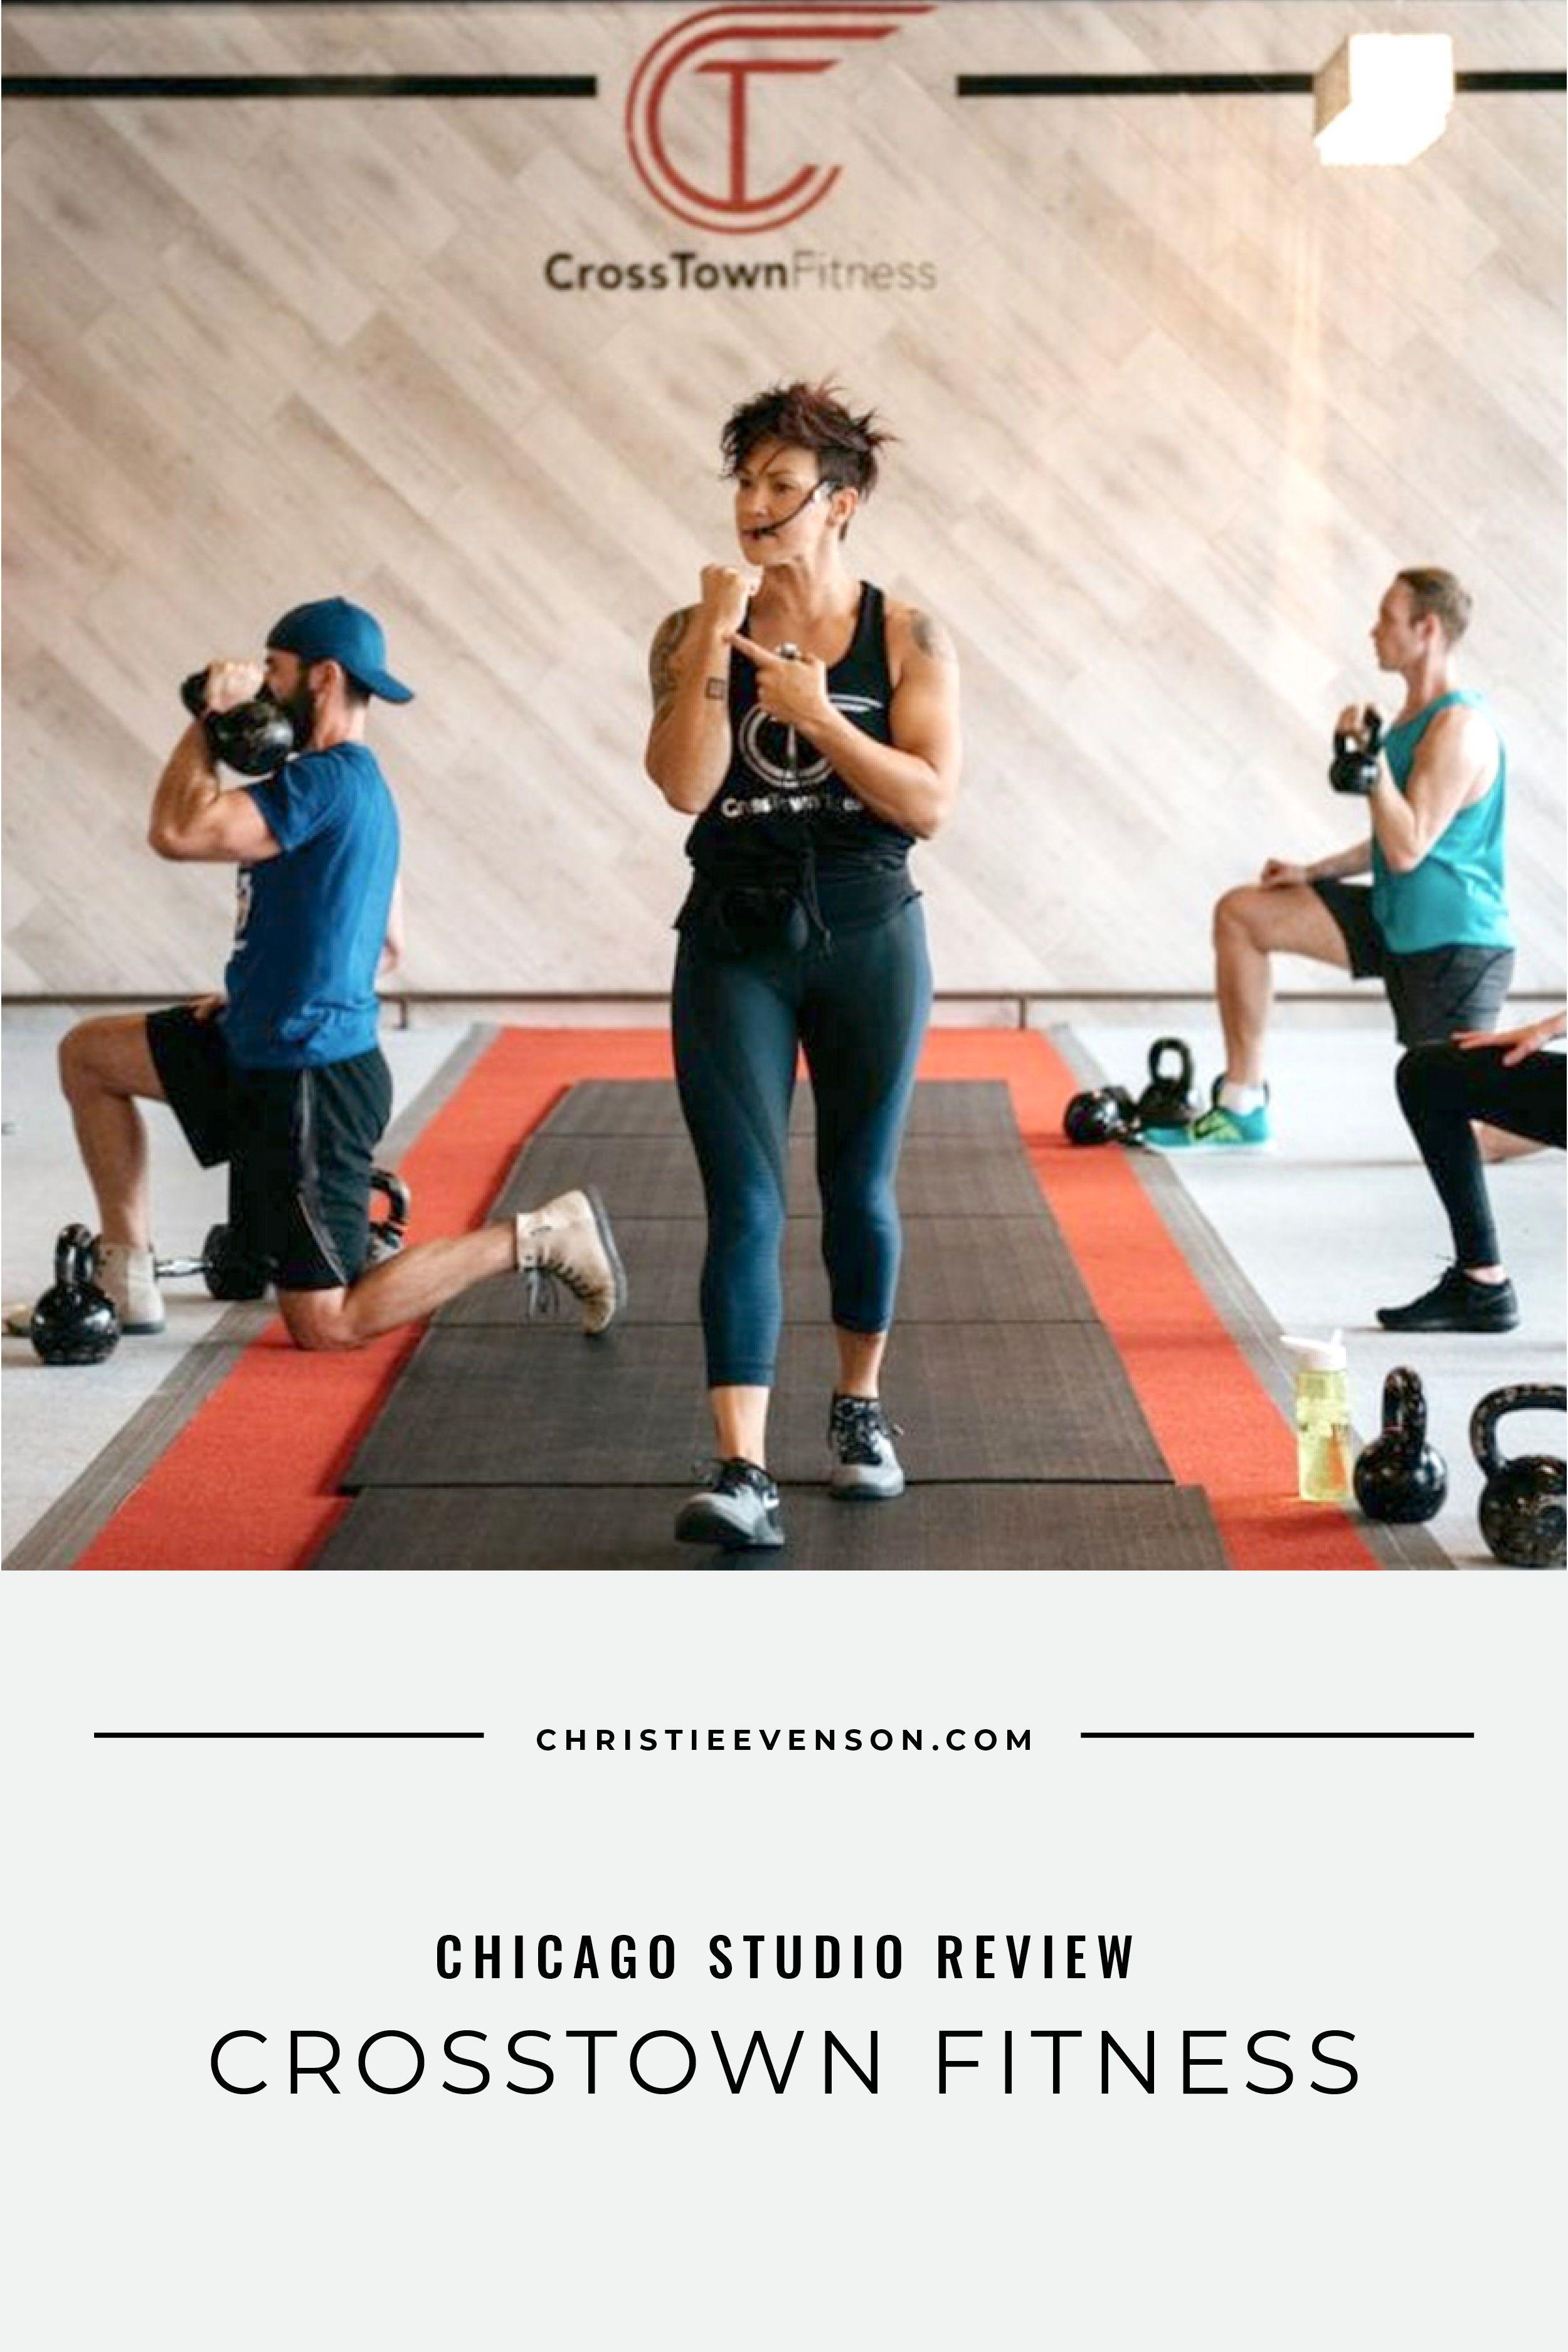 Chicago Studio Review Crosstown Fitness West Loop Christie Evenson Groupfitness Chicagofitness Chicagoworkout Chicago Fitness Aerial Fitness Fitness